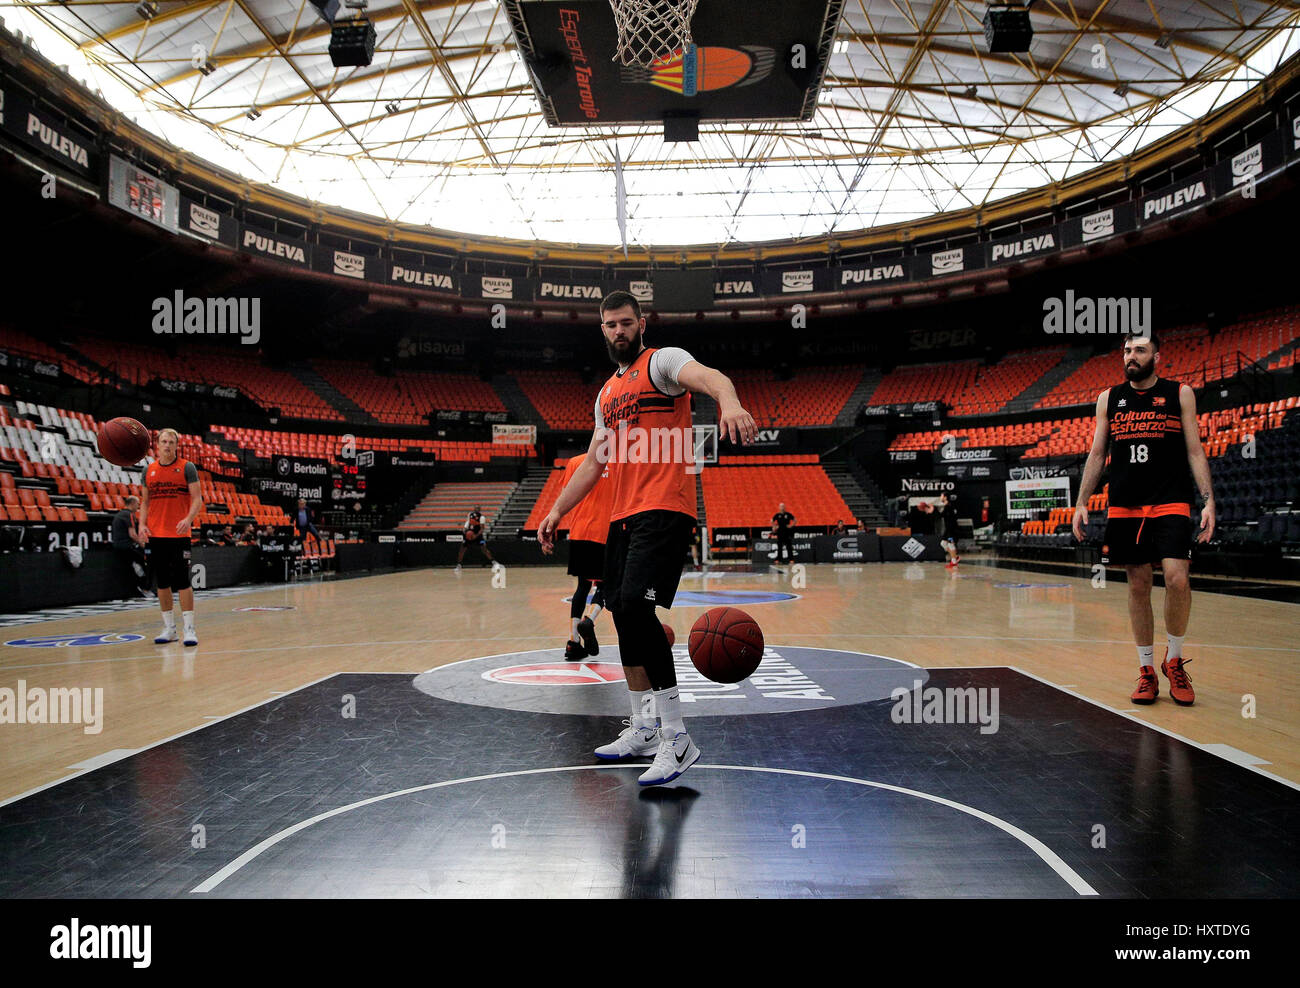 Valencia Basket S Montenegran Center Bojan Dubljevic Attends A